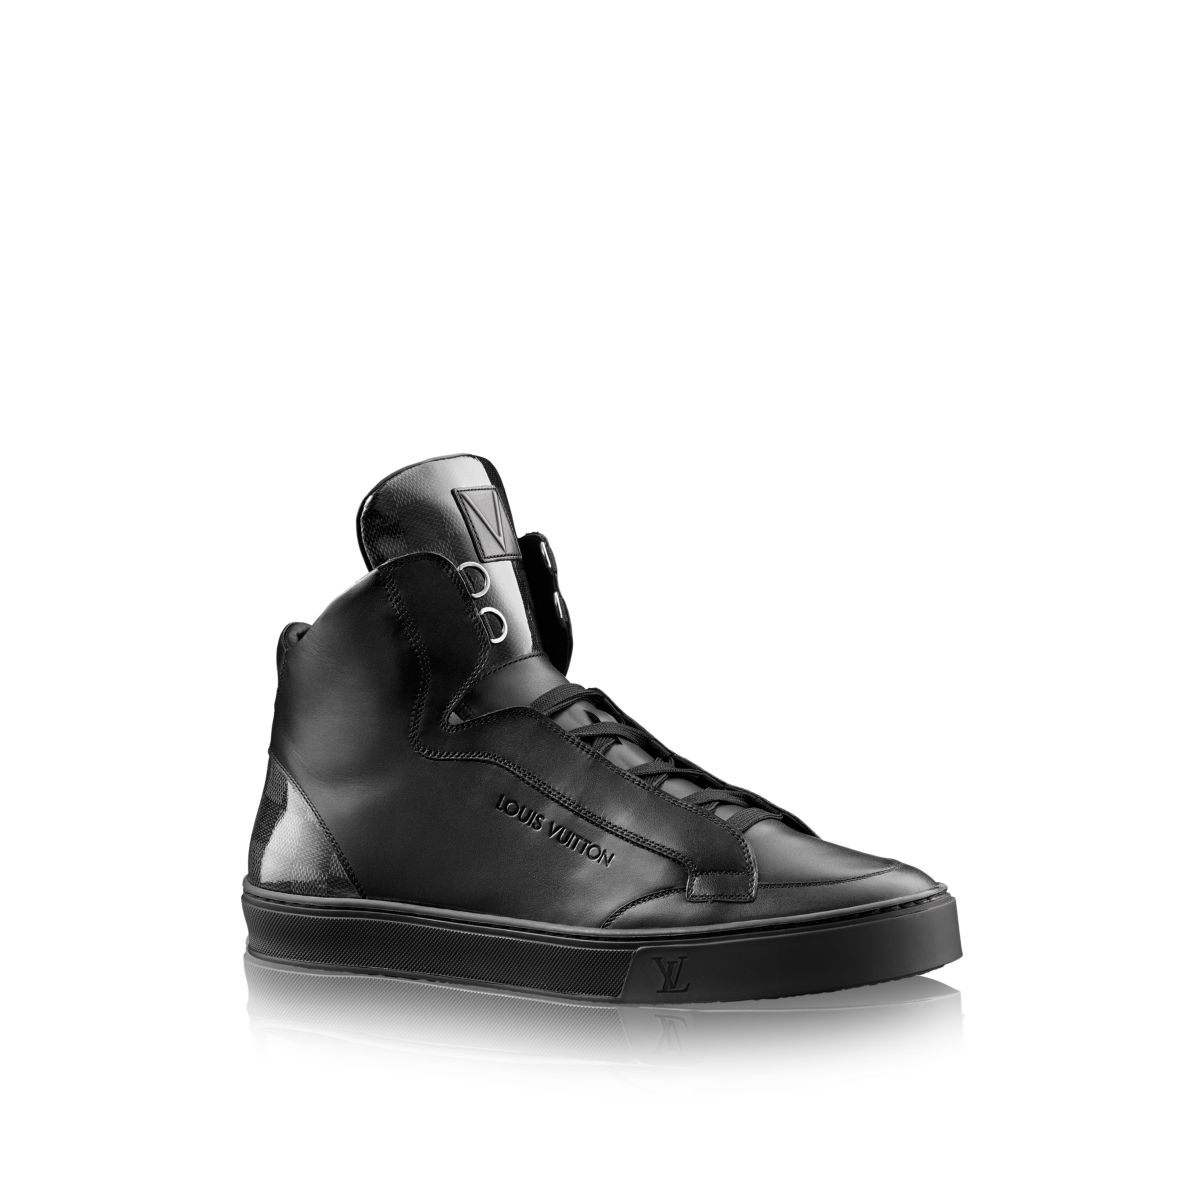 louis vuitton sneaker boot. Black Bedroom Furniture Sets. Home Design Ideas